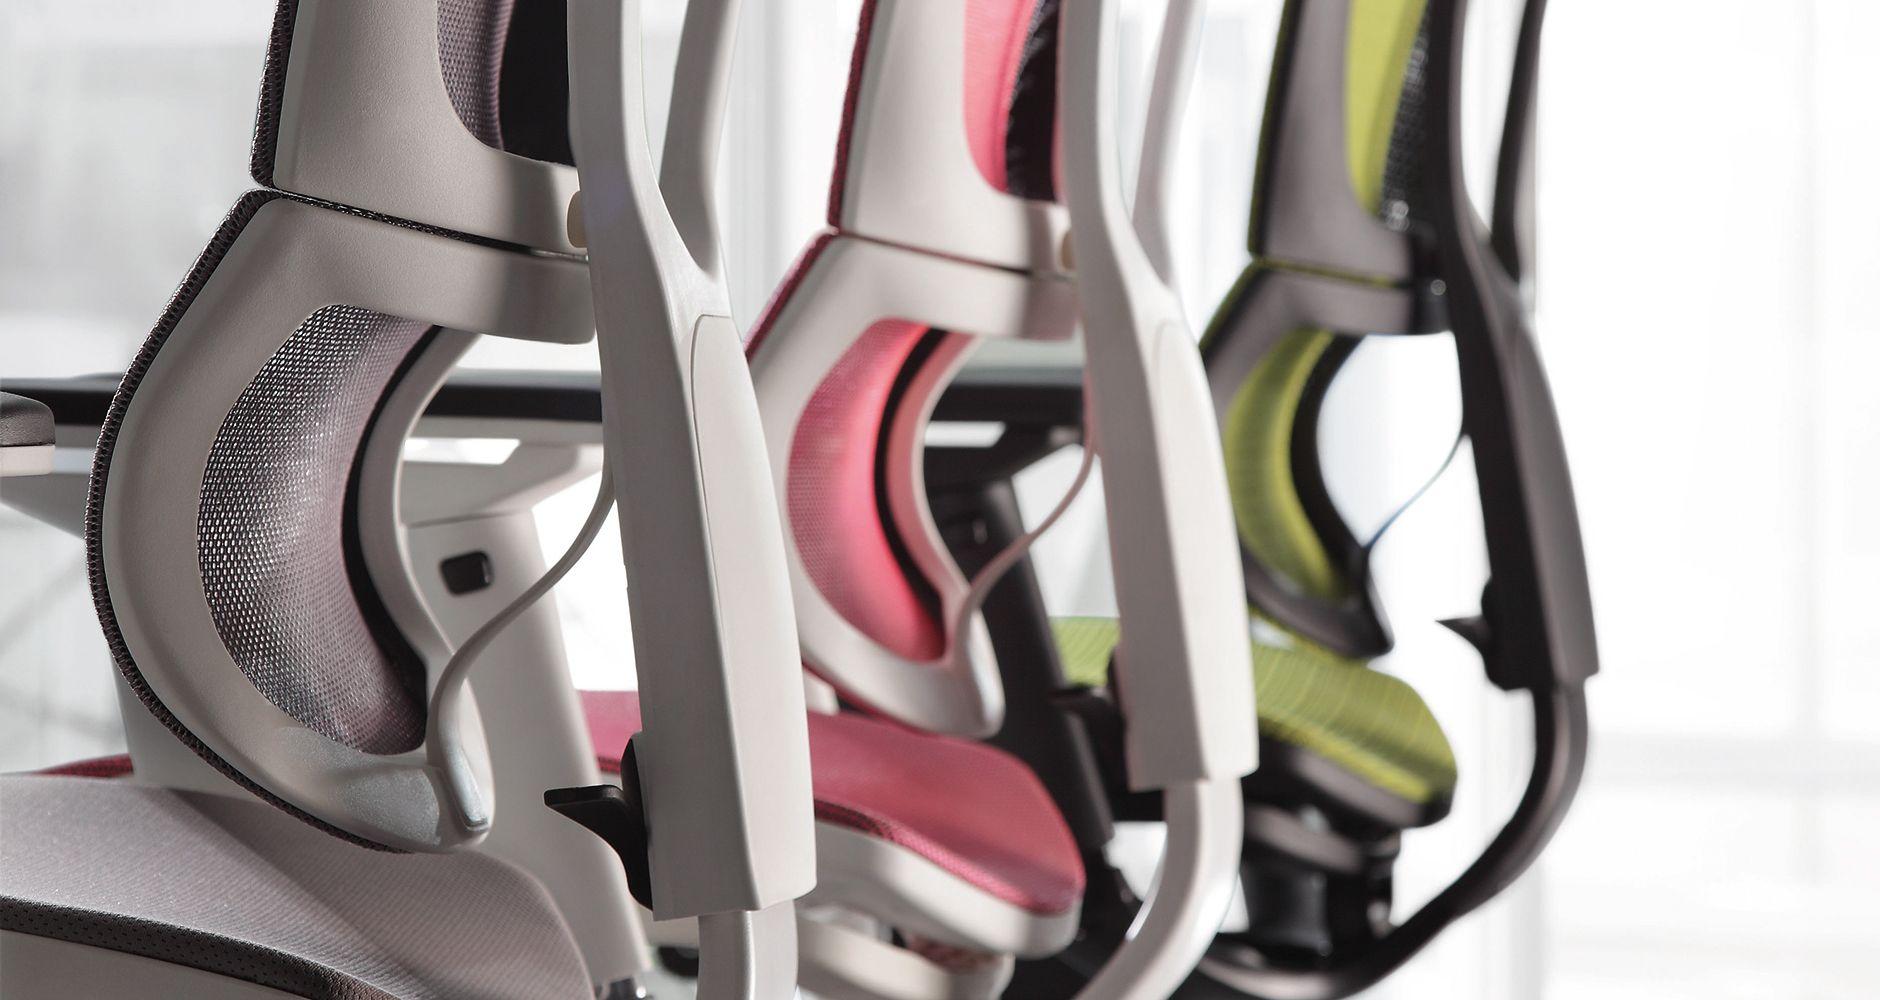 Scaun de Birou Reglabil - Electric - Stand Up - Mirus Parallax